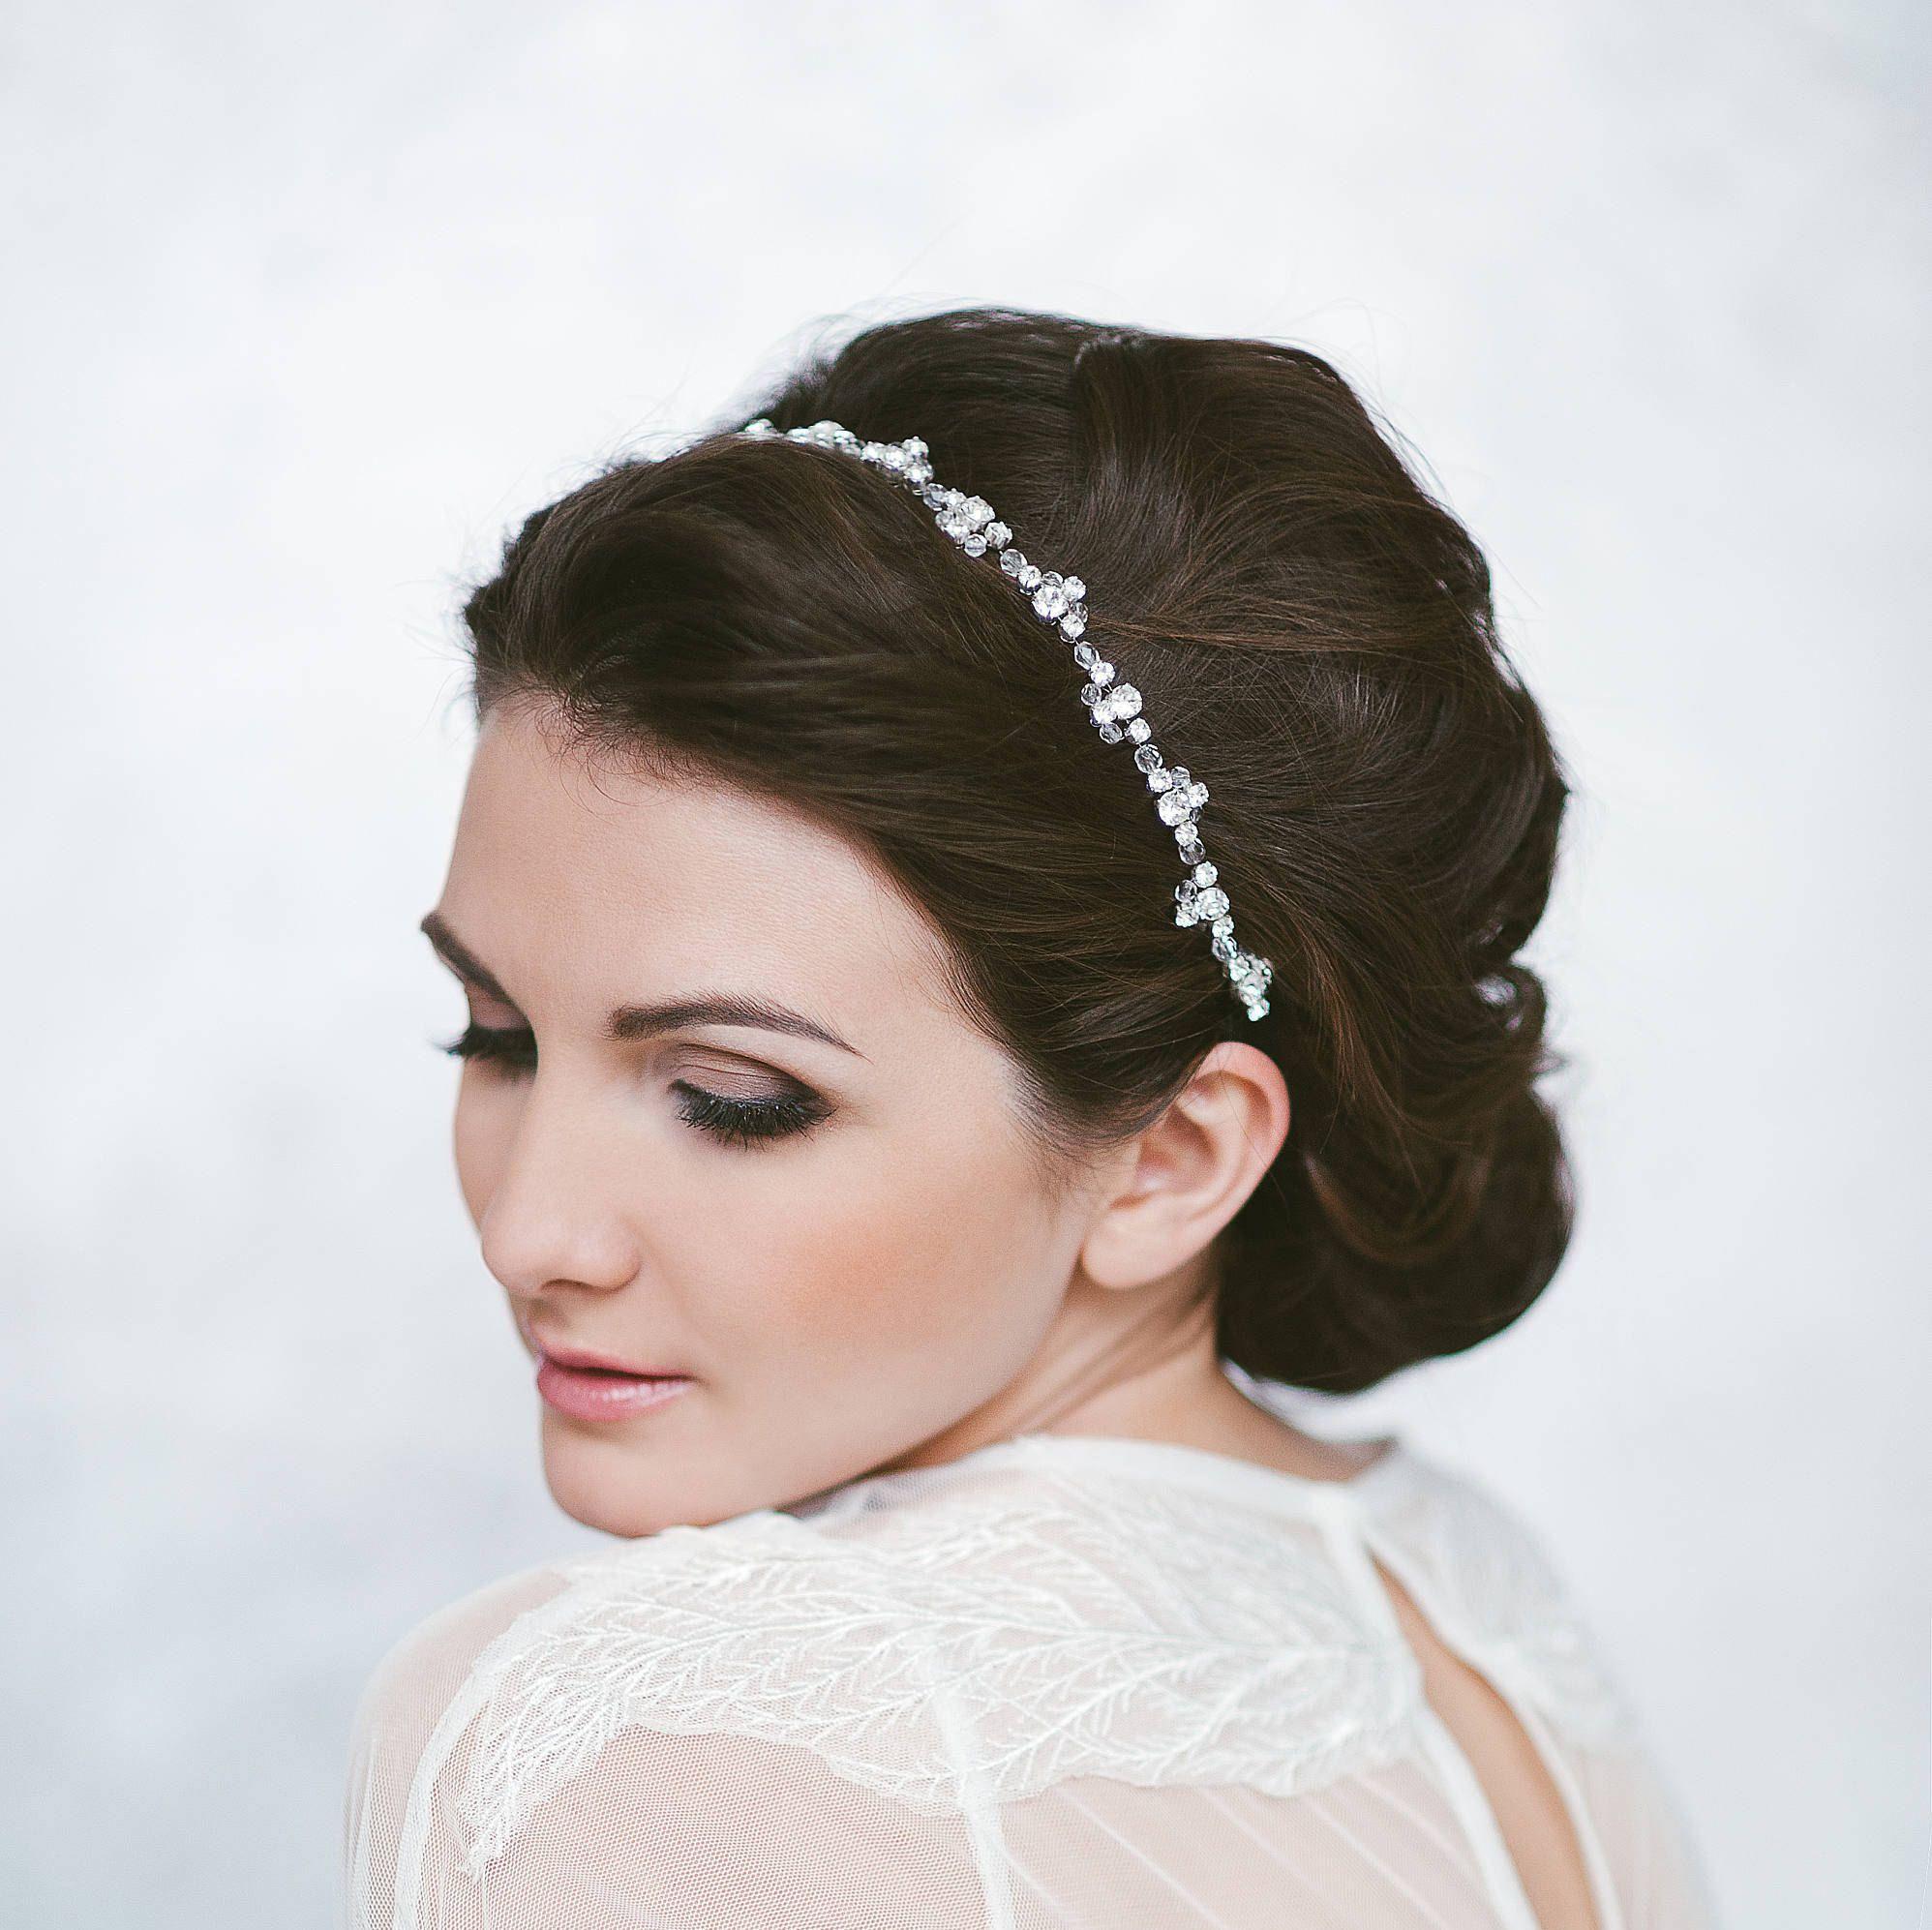 Classic Wedding Headband Bridal Headpiece Bride Hair Piece Etsy Flower Hair Accessories Wedding Wedding Hair Accessories Flower Girl Headpiece